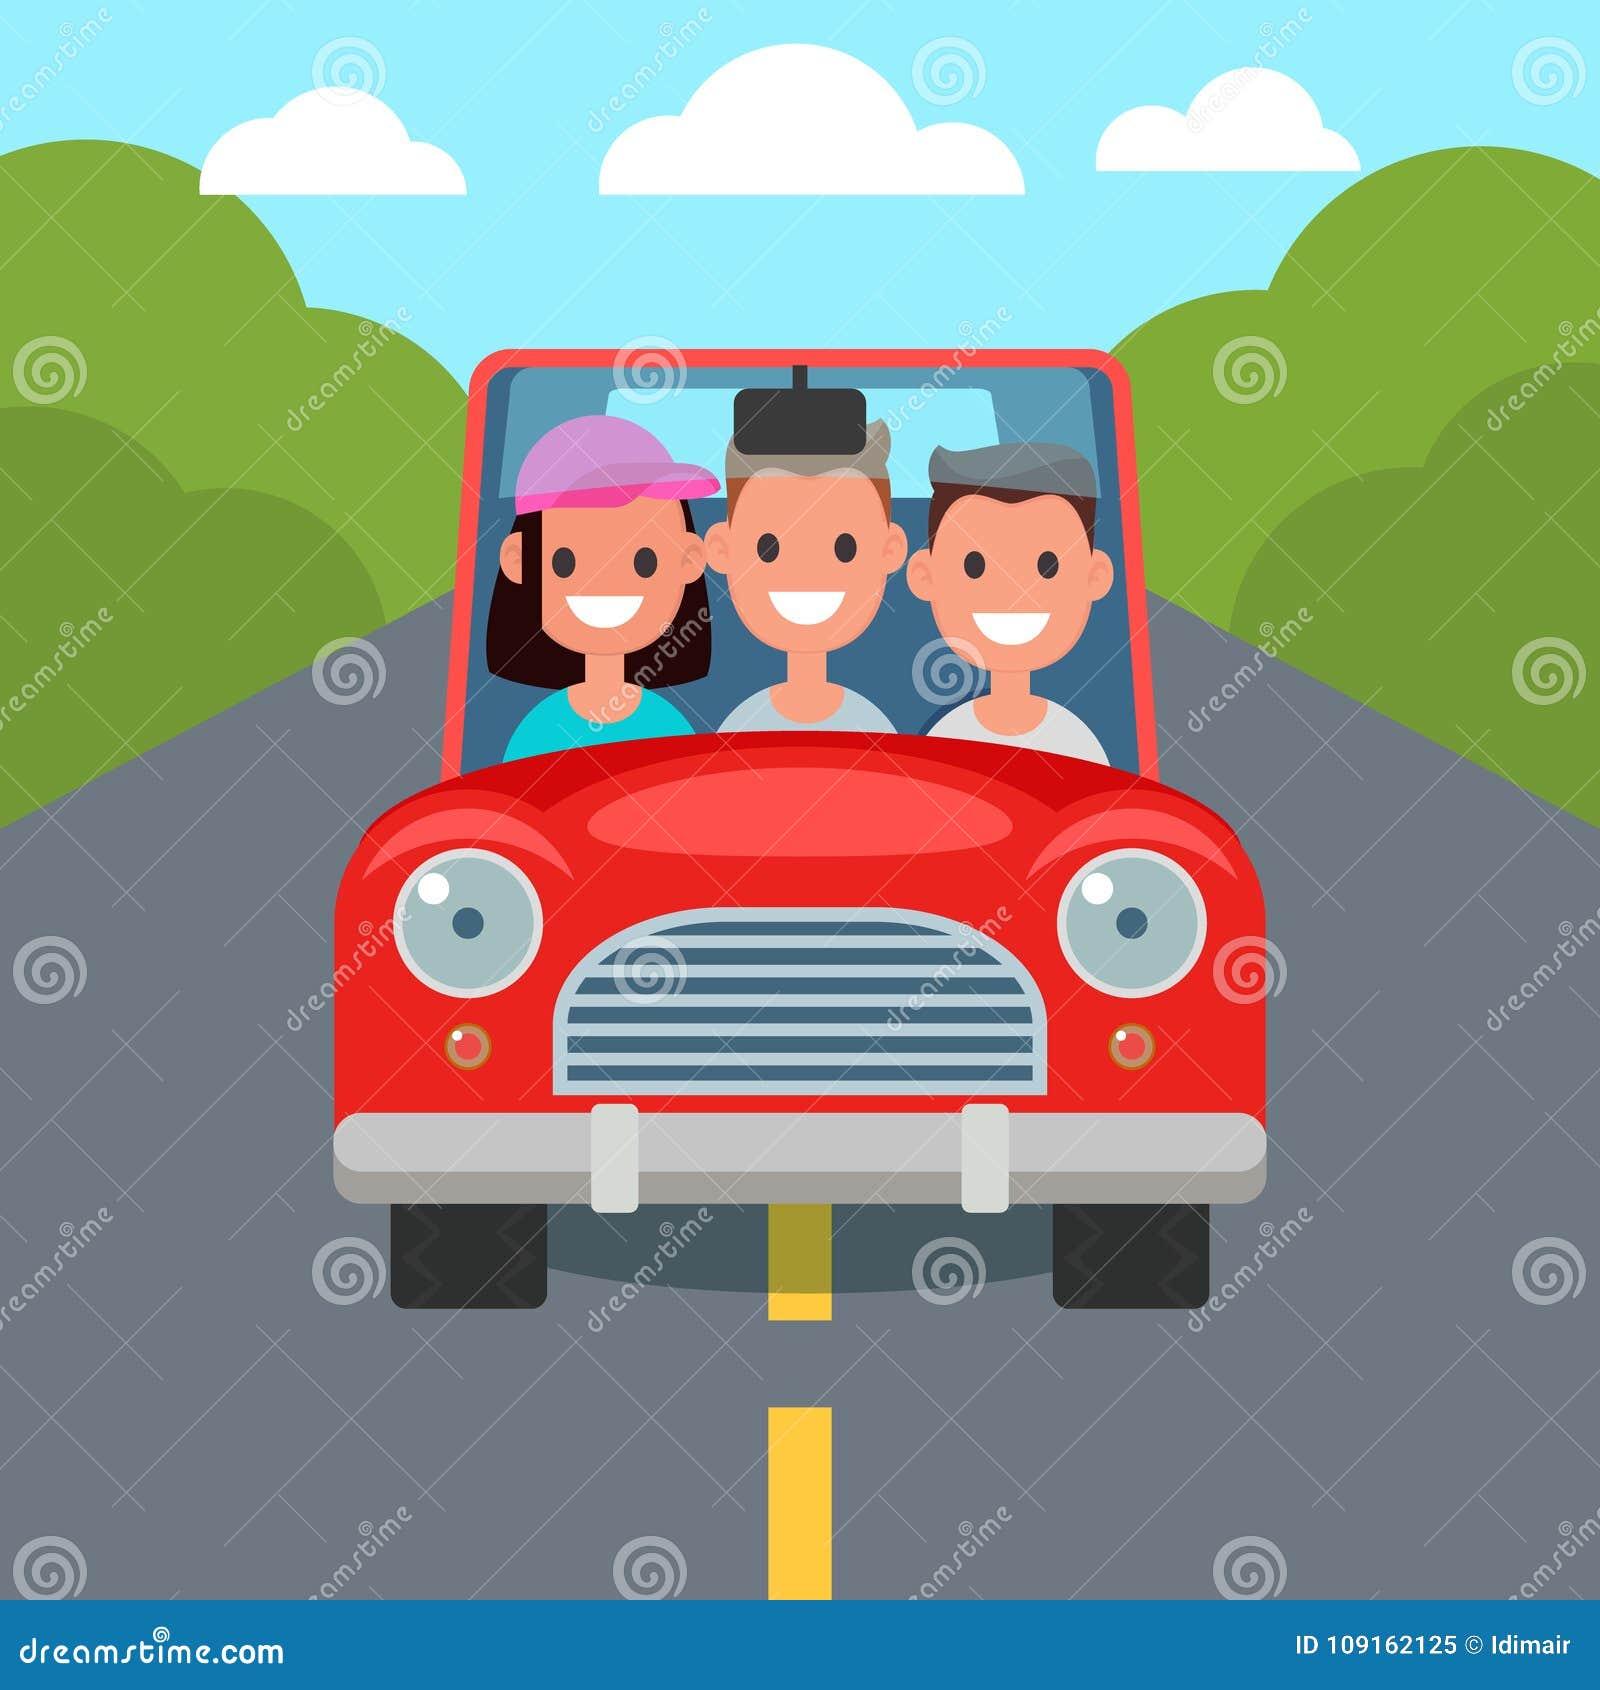 Flat Design Car Driving Characters. Car sharing. Vector